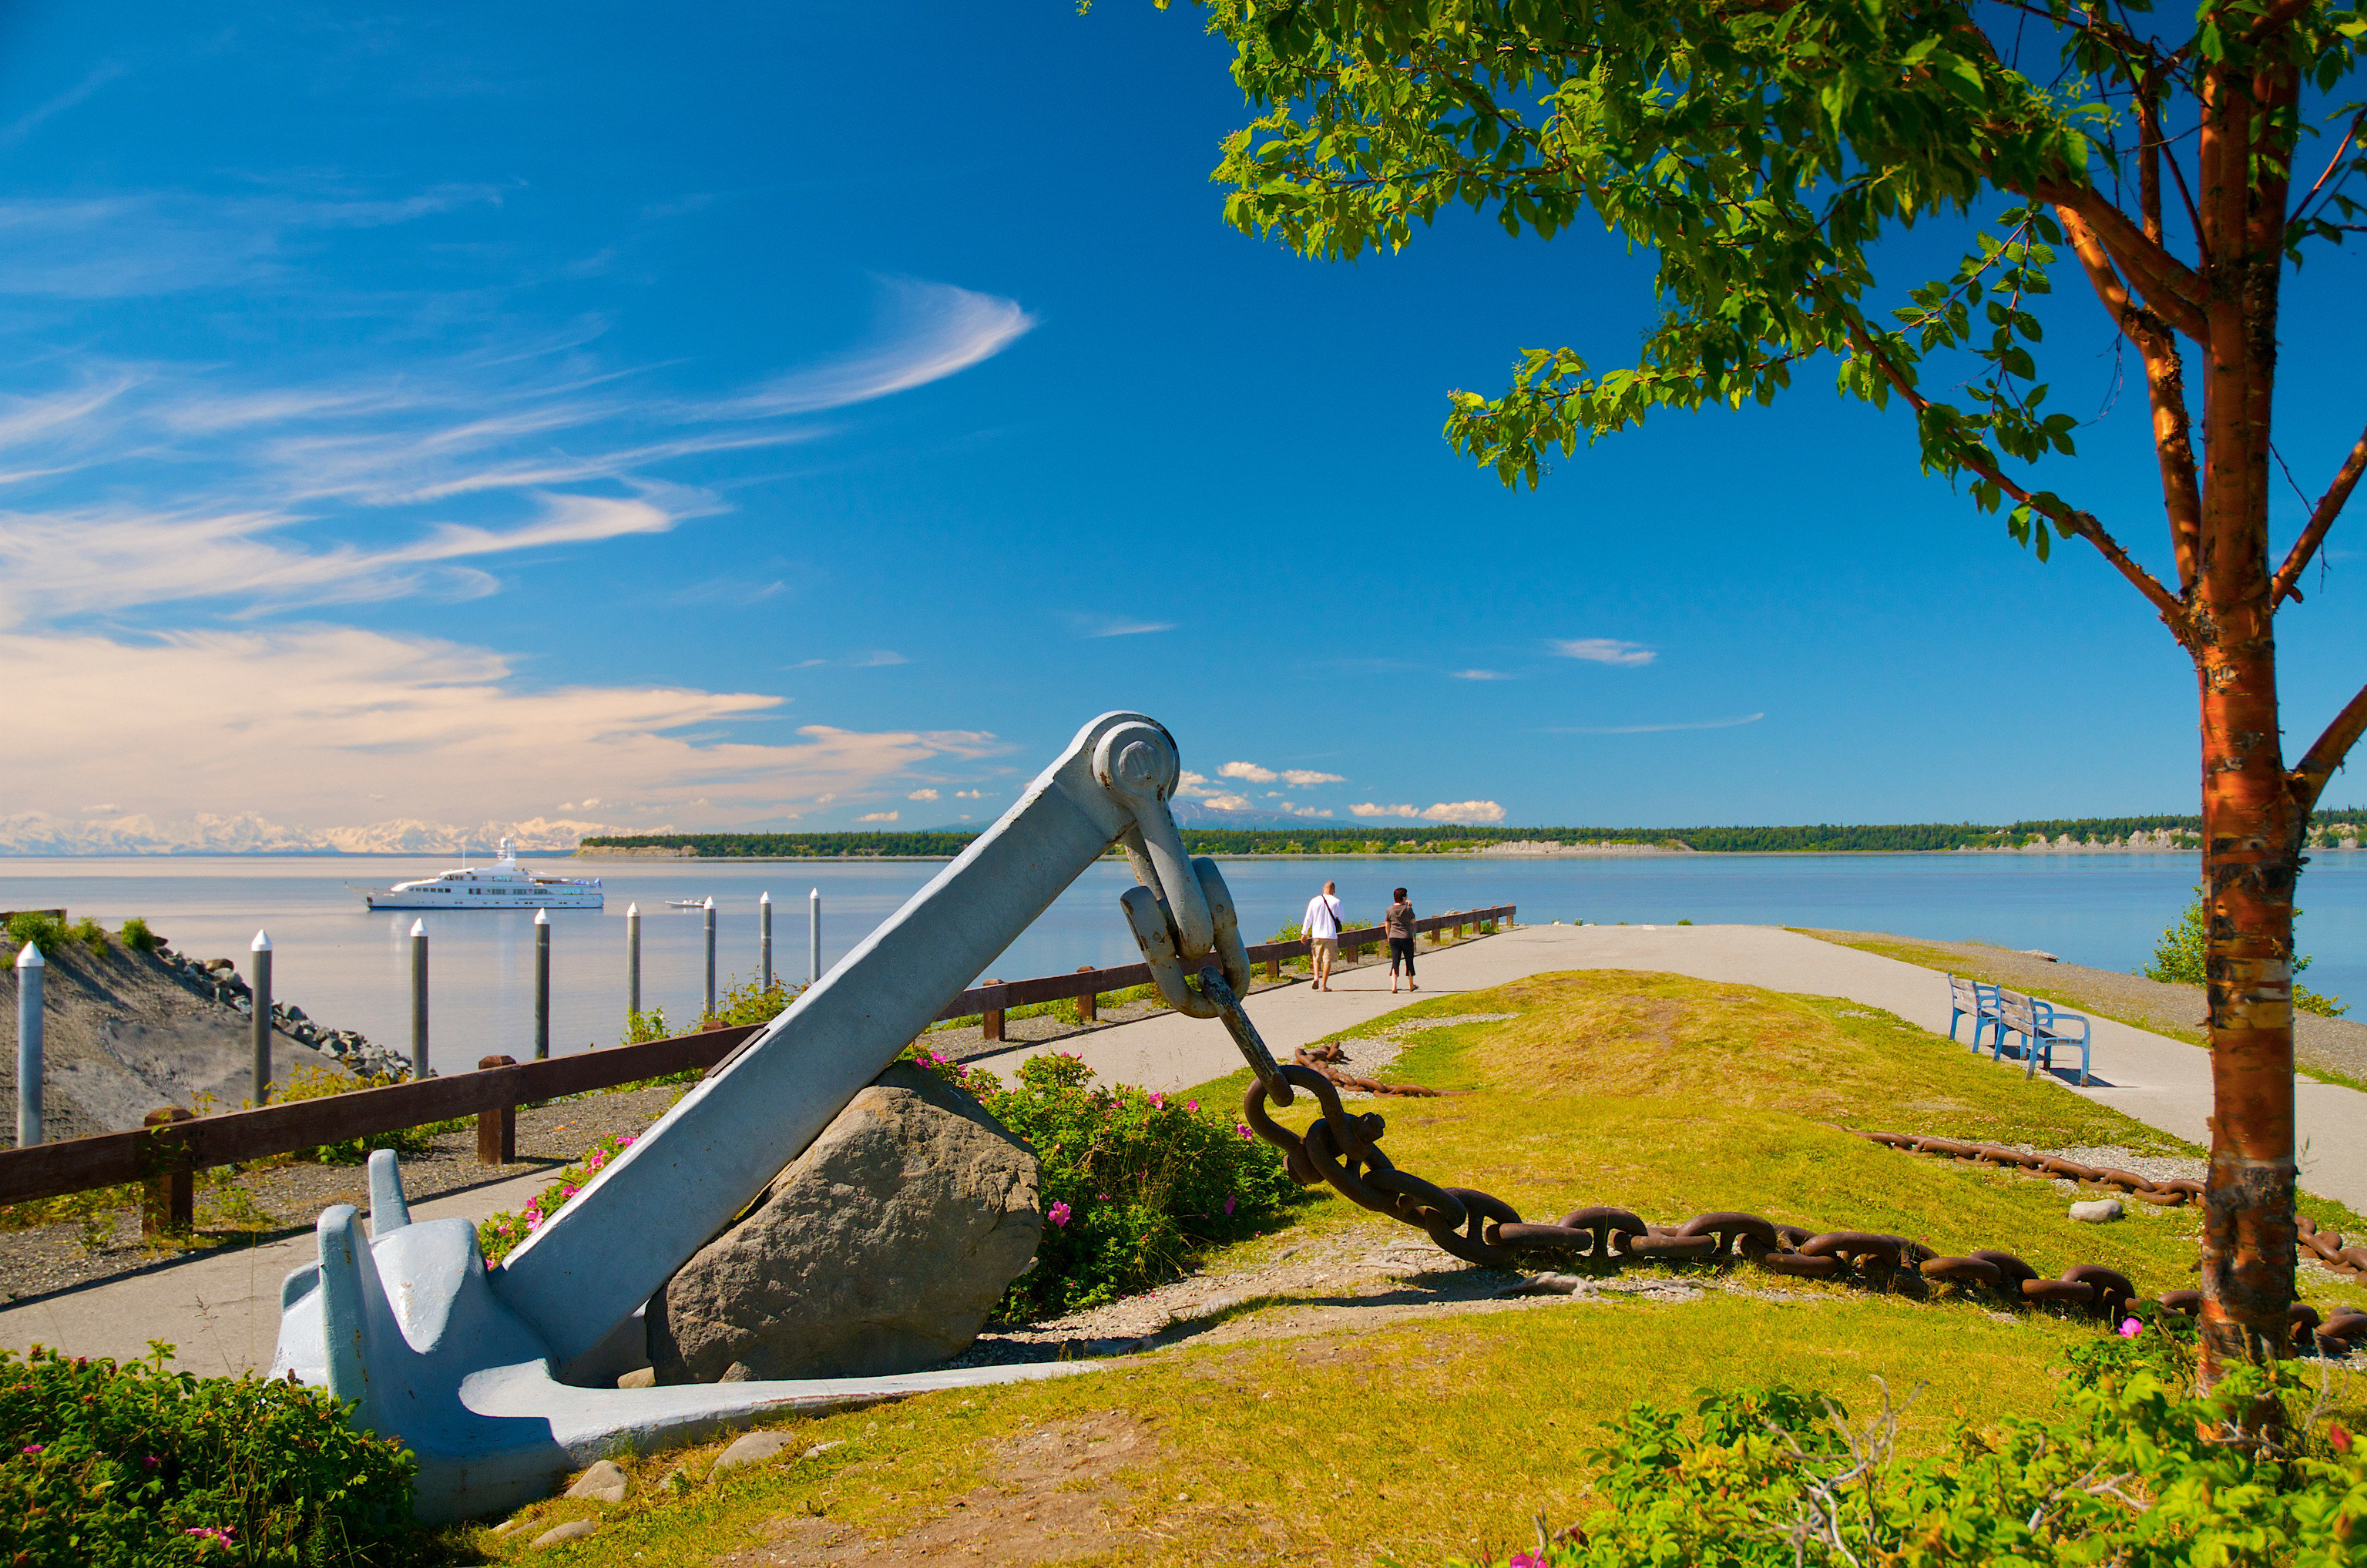 Trip Ideas sky grass outdoor tree shore vacation Sea Coast Beach landscape flower Lake bay